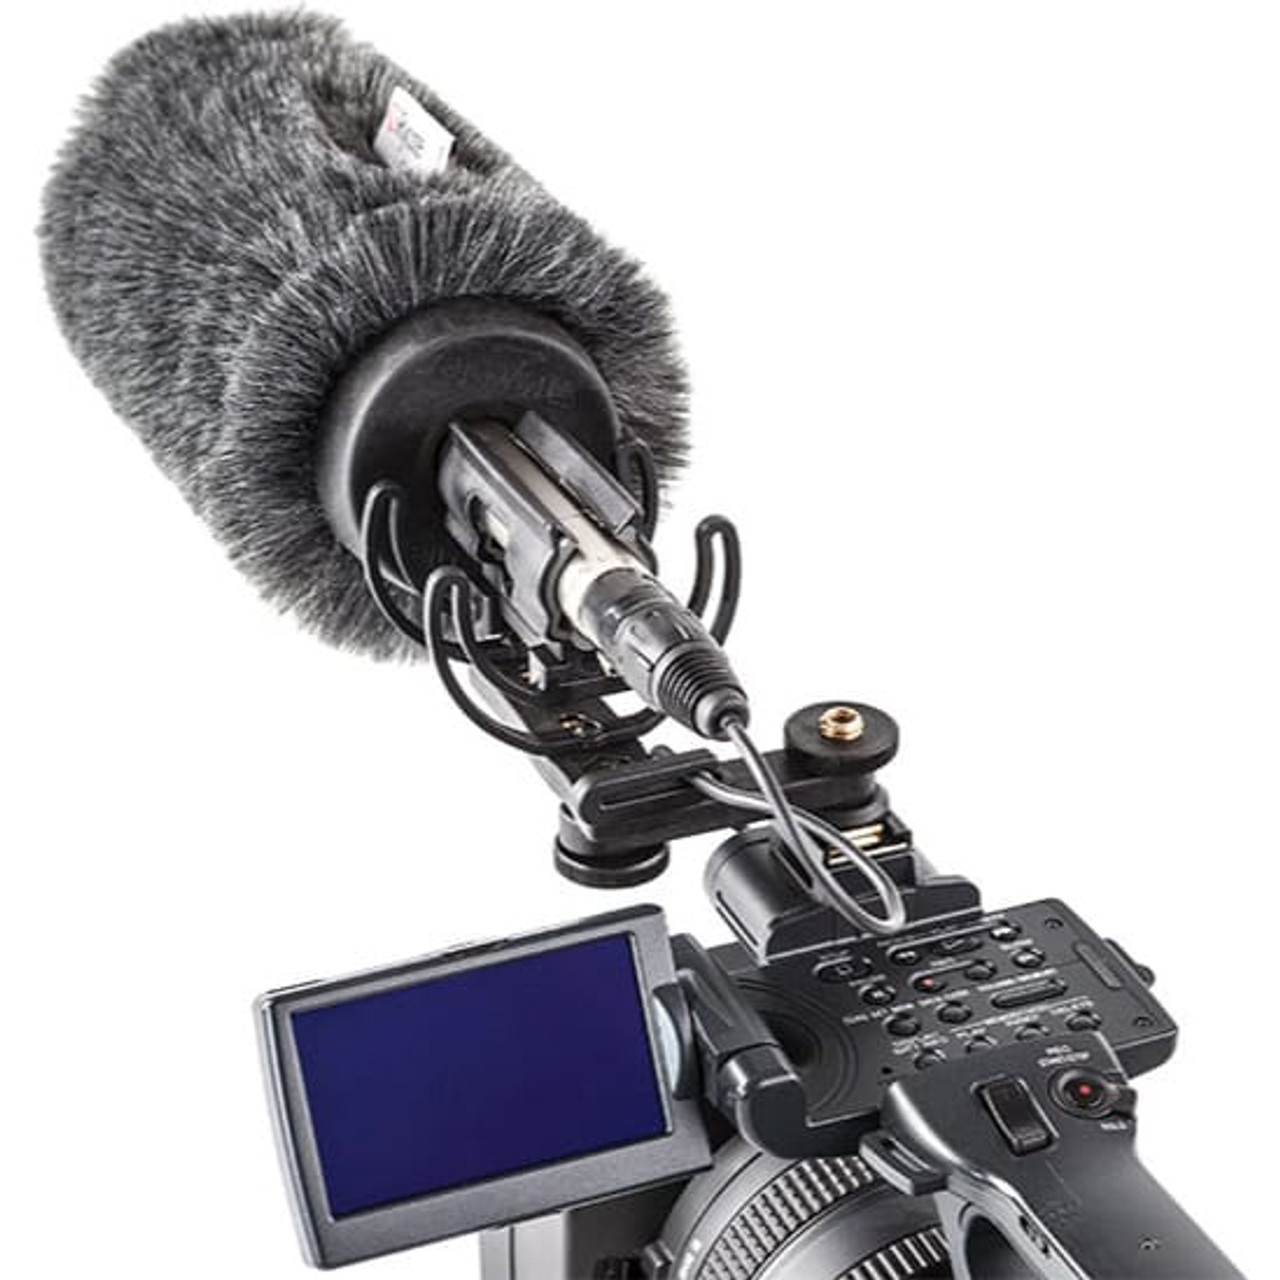 Rycote 033053 18cm 24-25mm Large Hole Classic Softie Microphone Windshield